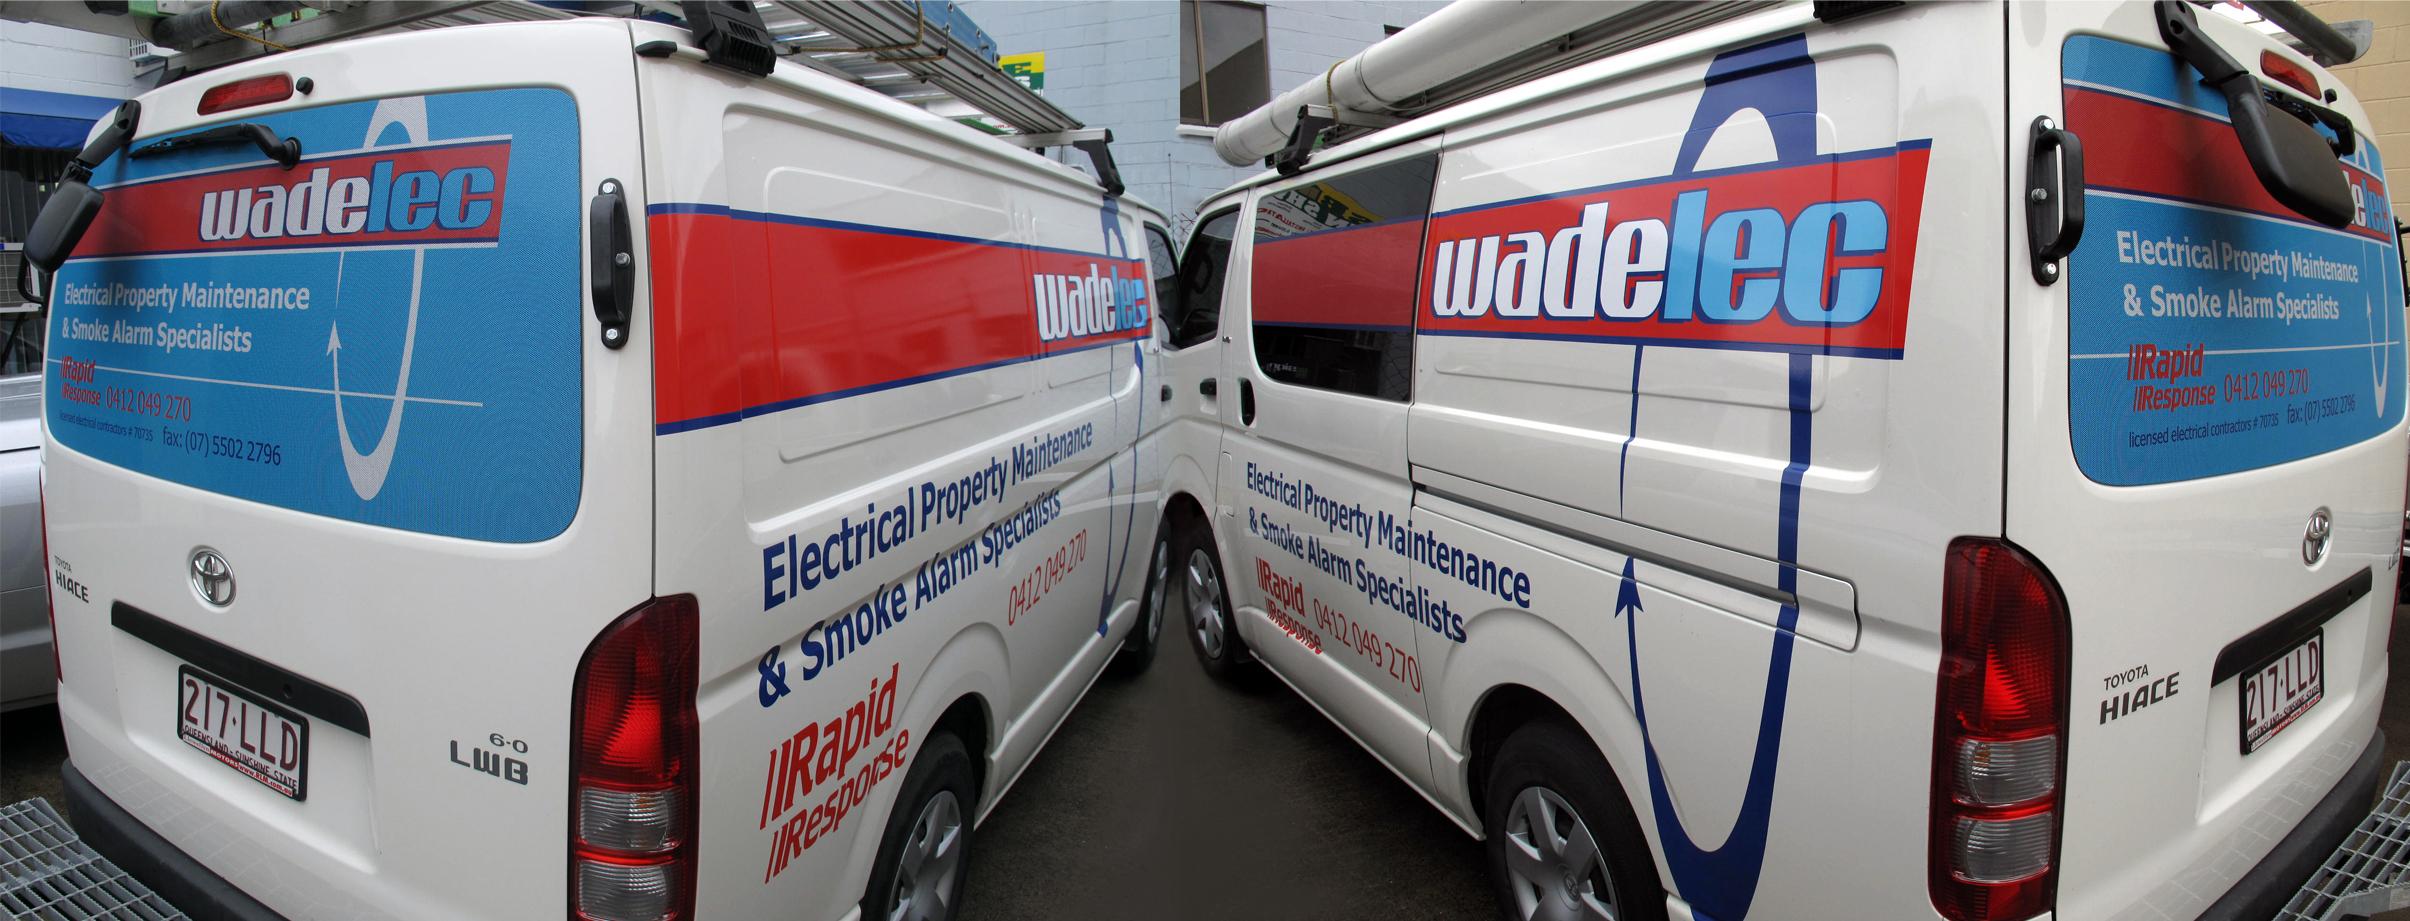 Wade Electrical Van